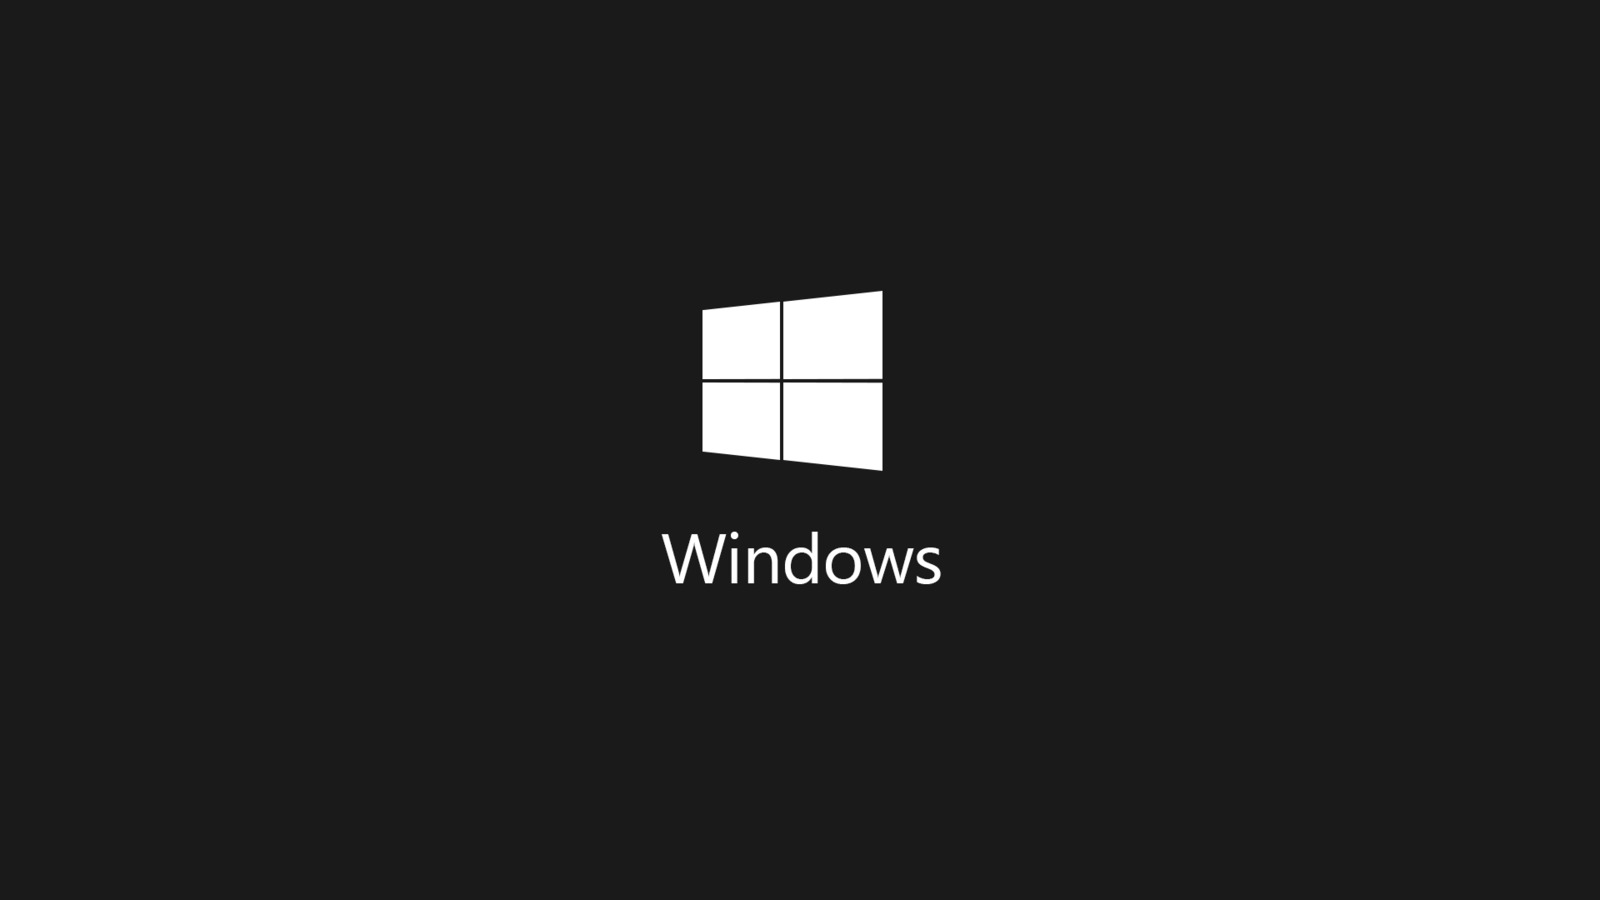 1600x900 Windows Dark 1600x900 Resolution Hd 4k Wallpapers Images